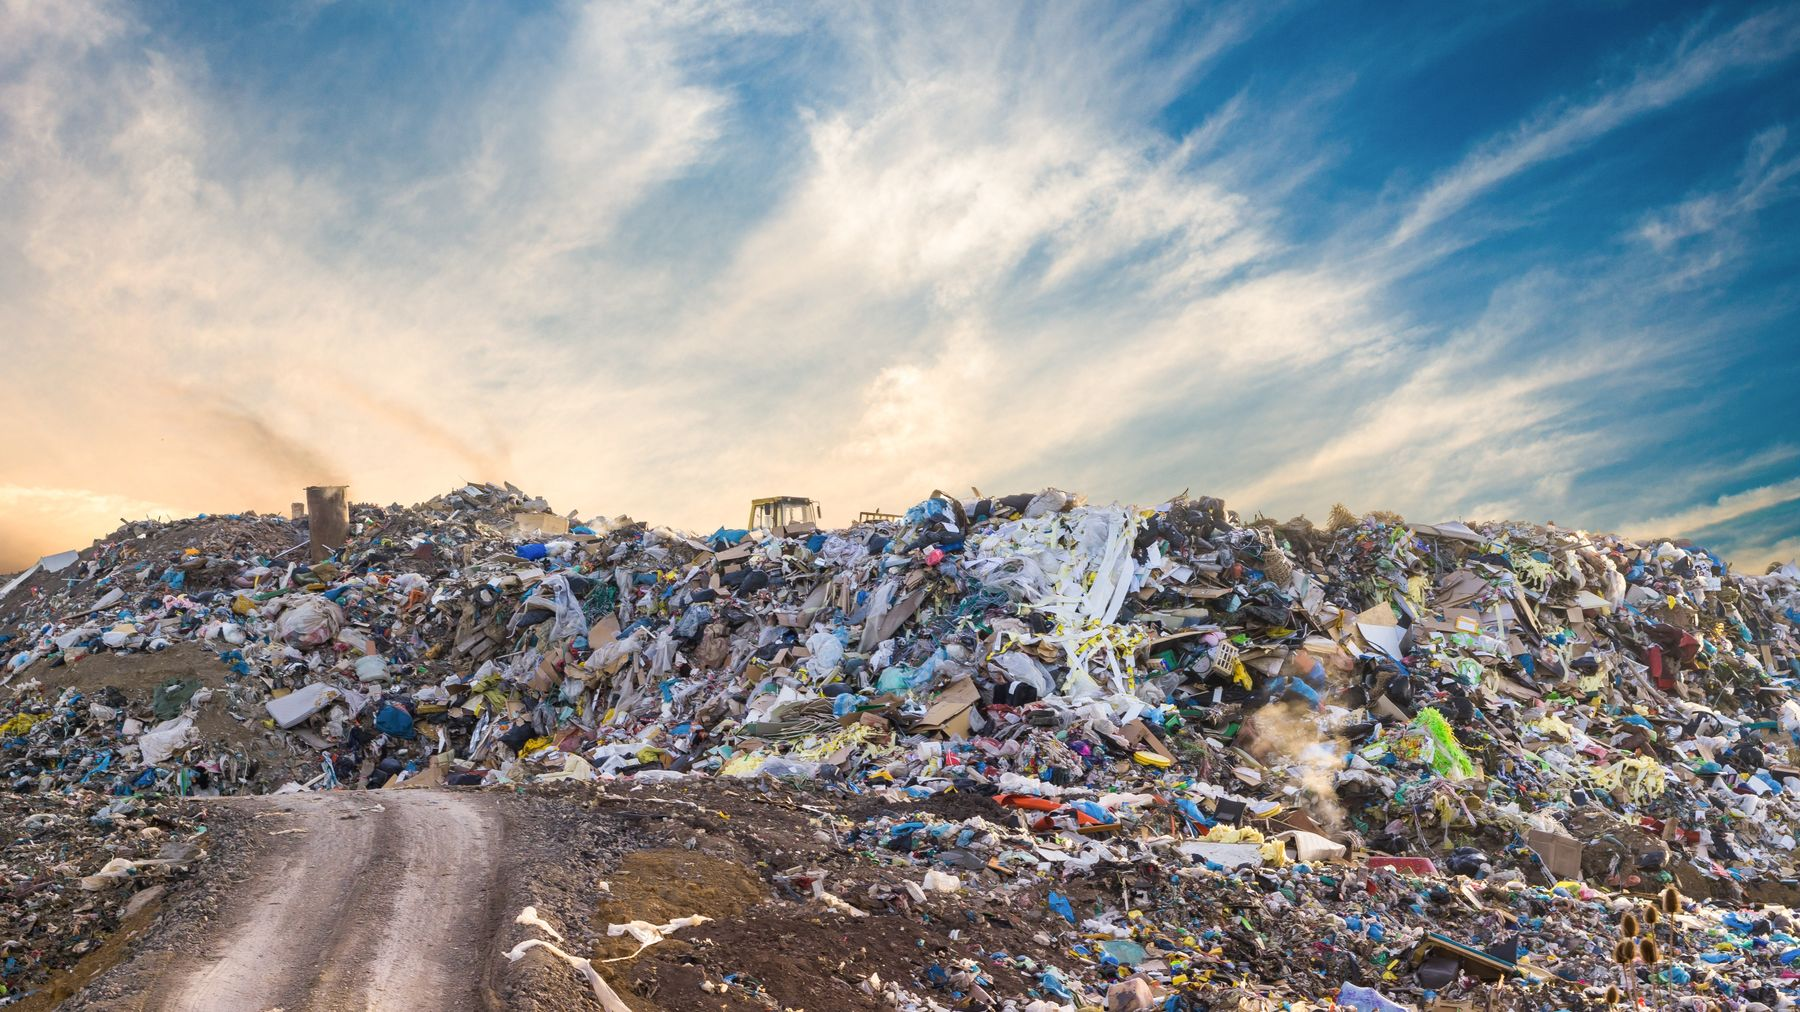 vertedero-plastico-reciclaje-ropa-sostenible